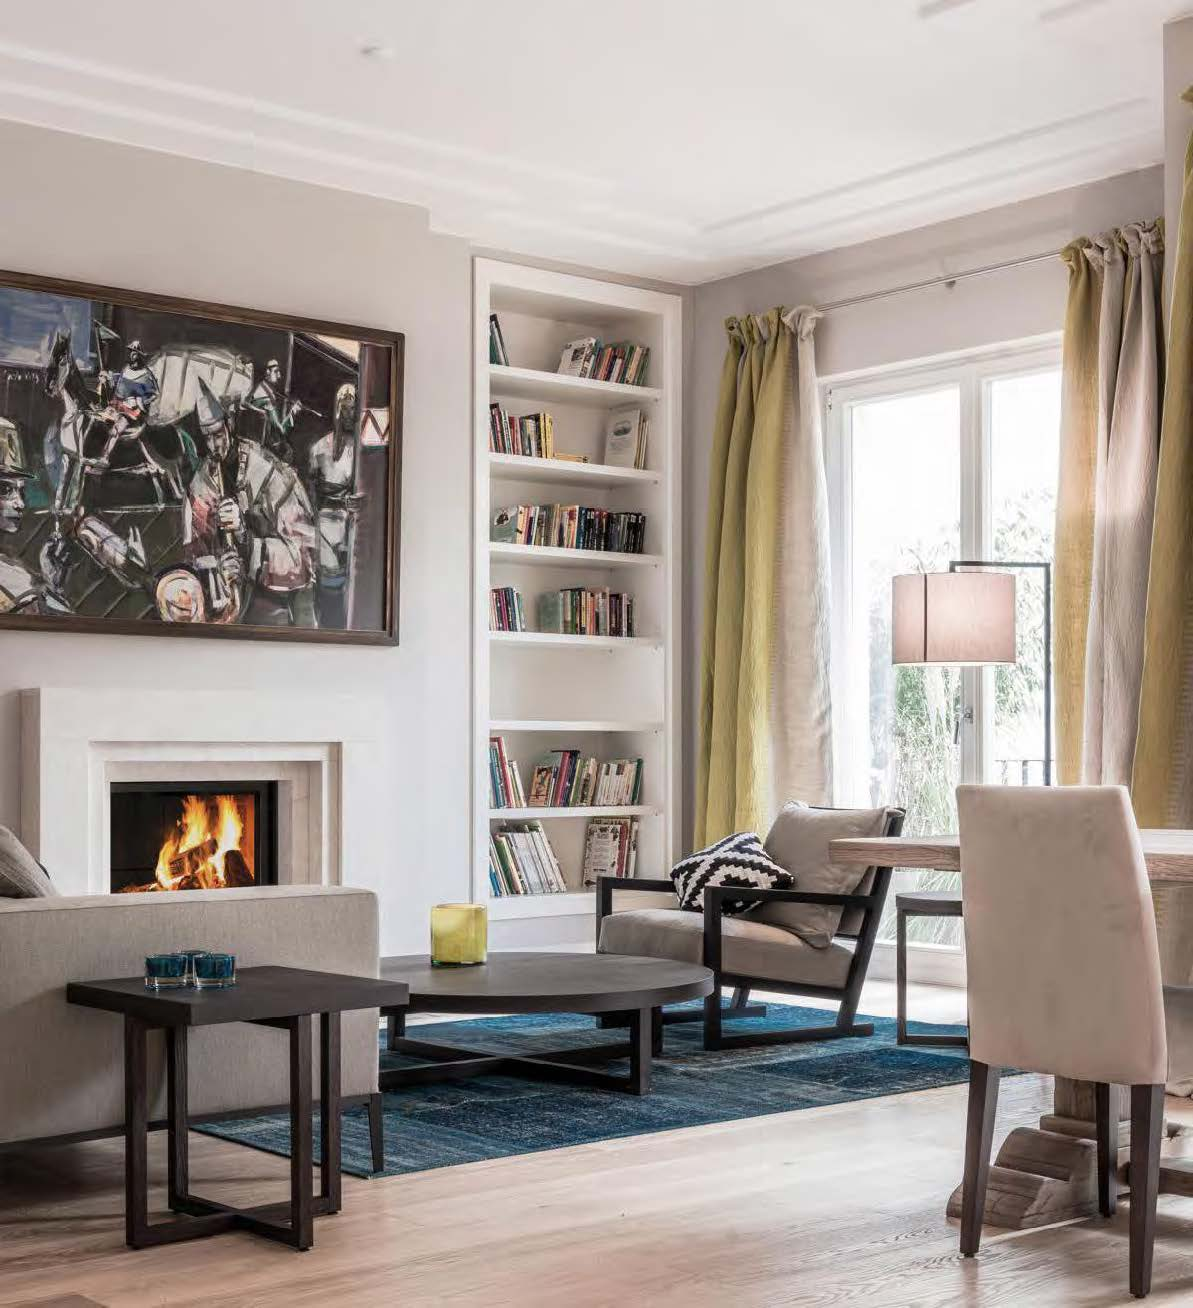 Apartamento para Venda às Luxurious new construction in the most exclusive street in Berlin! Berlin, Berlim, 10719 Alemanha